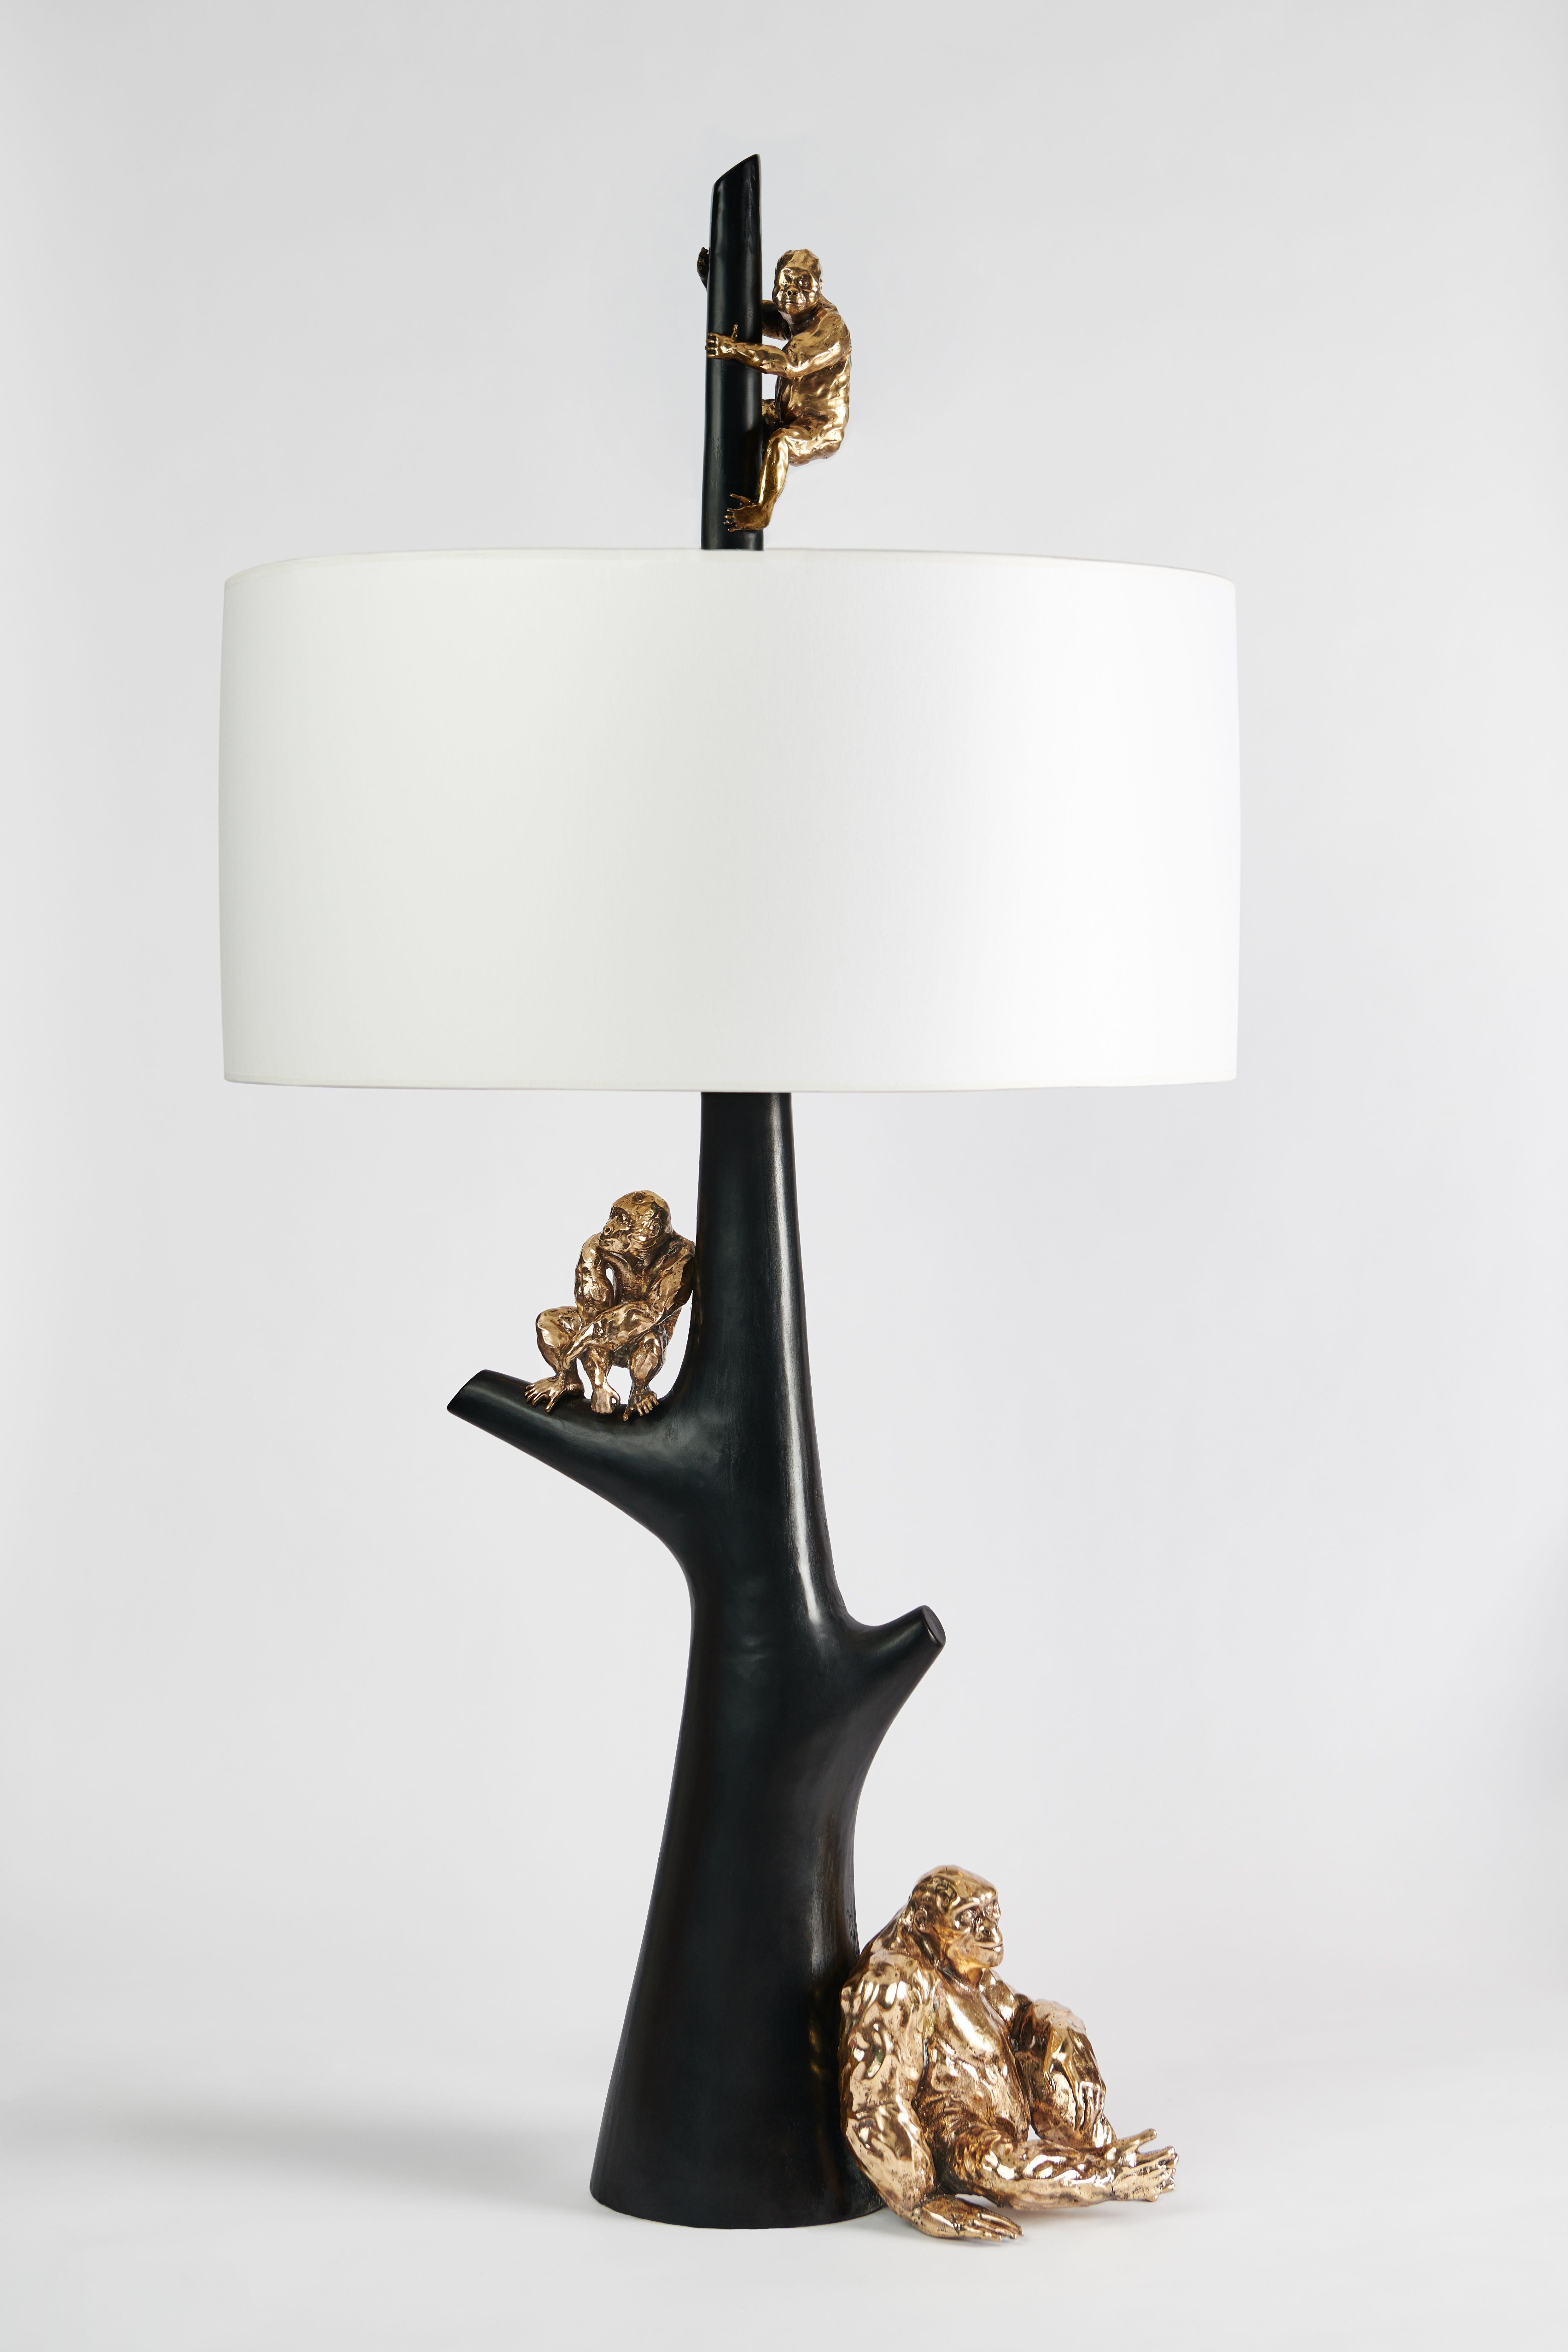 Sculptural Bronze Table Lamp Bases